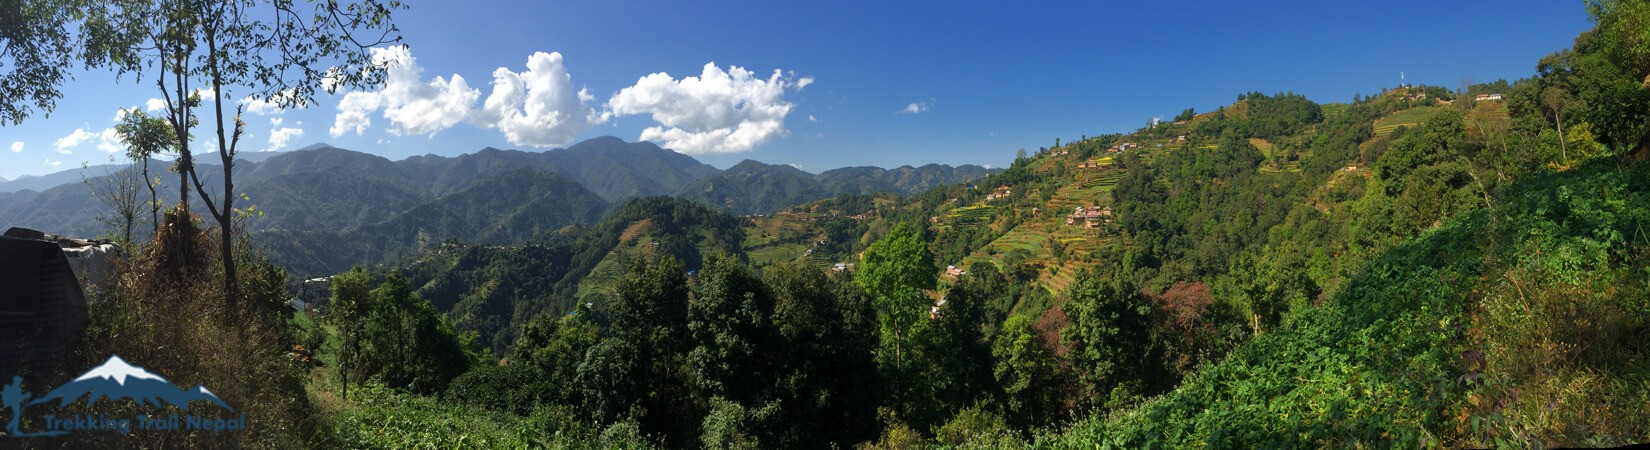 View from Ranikot Village Hiking